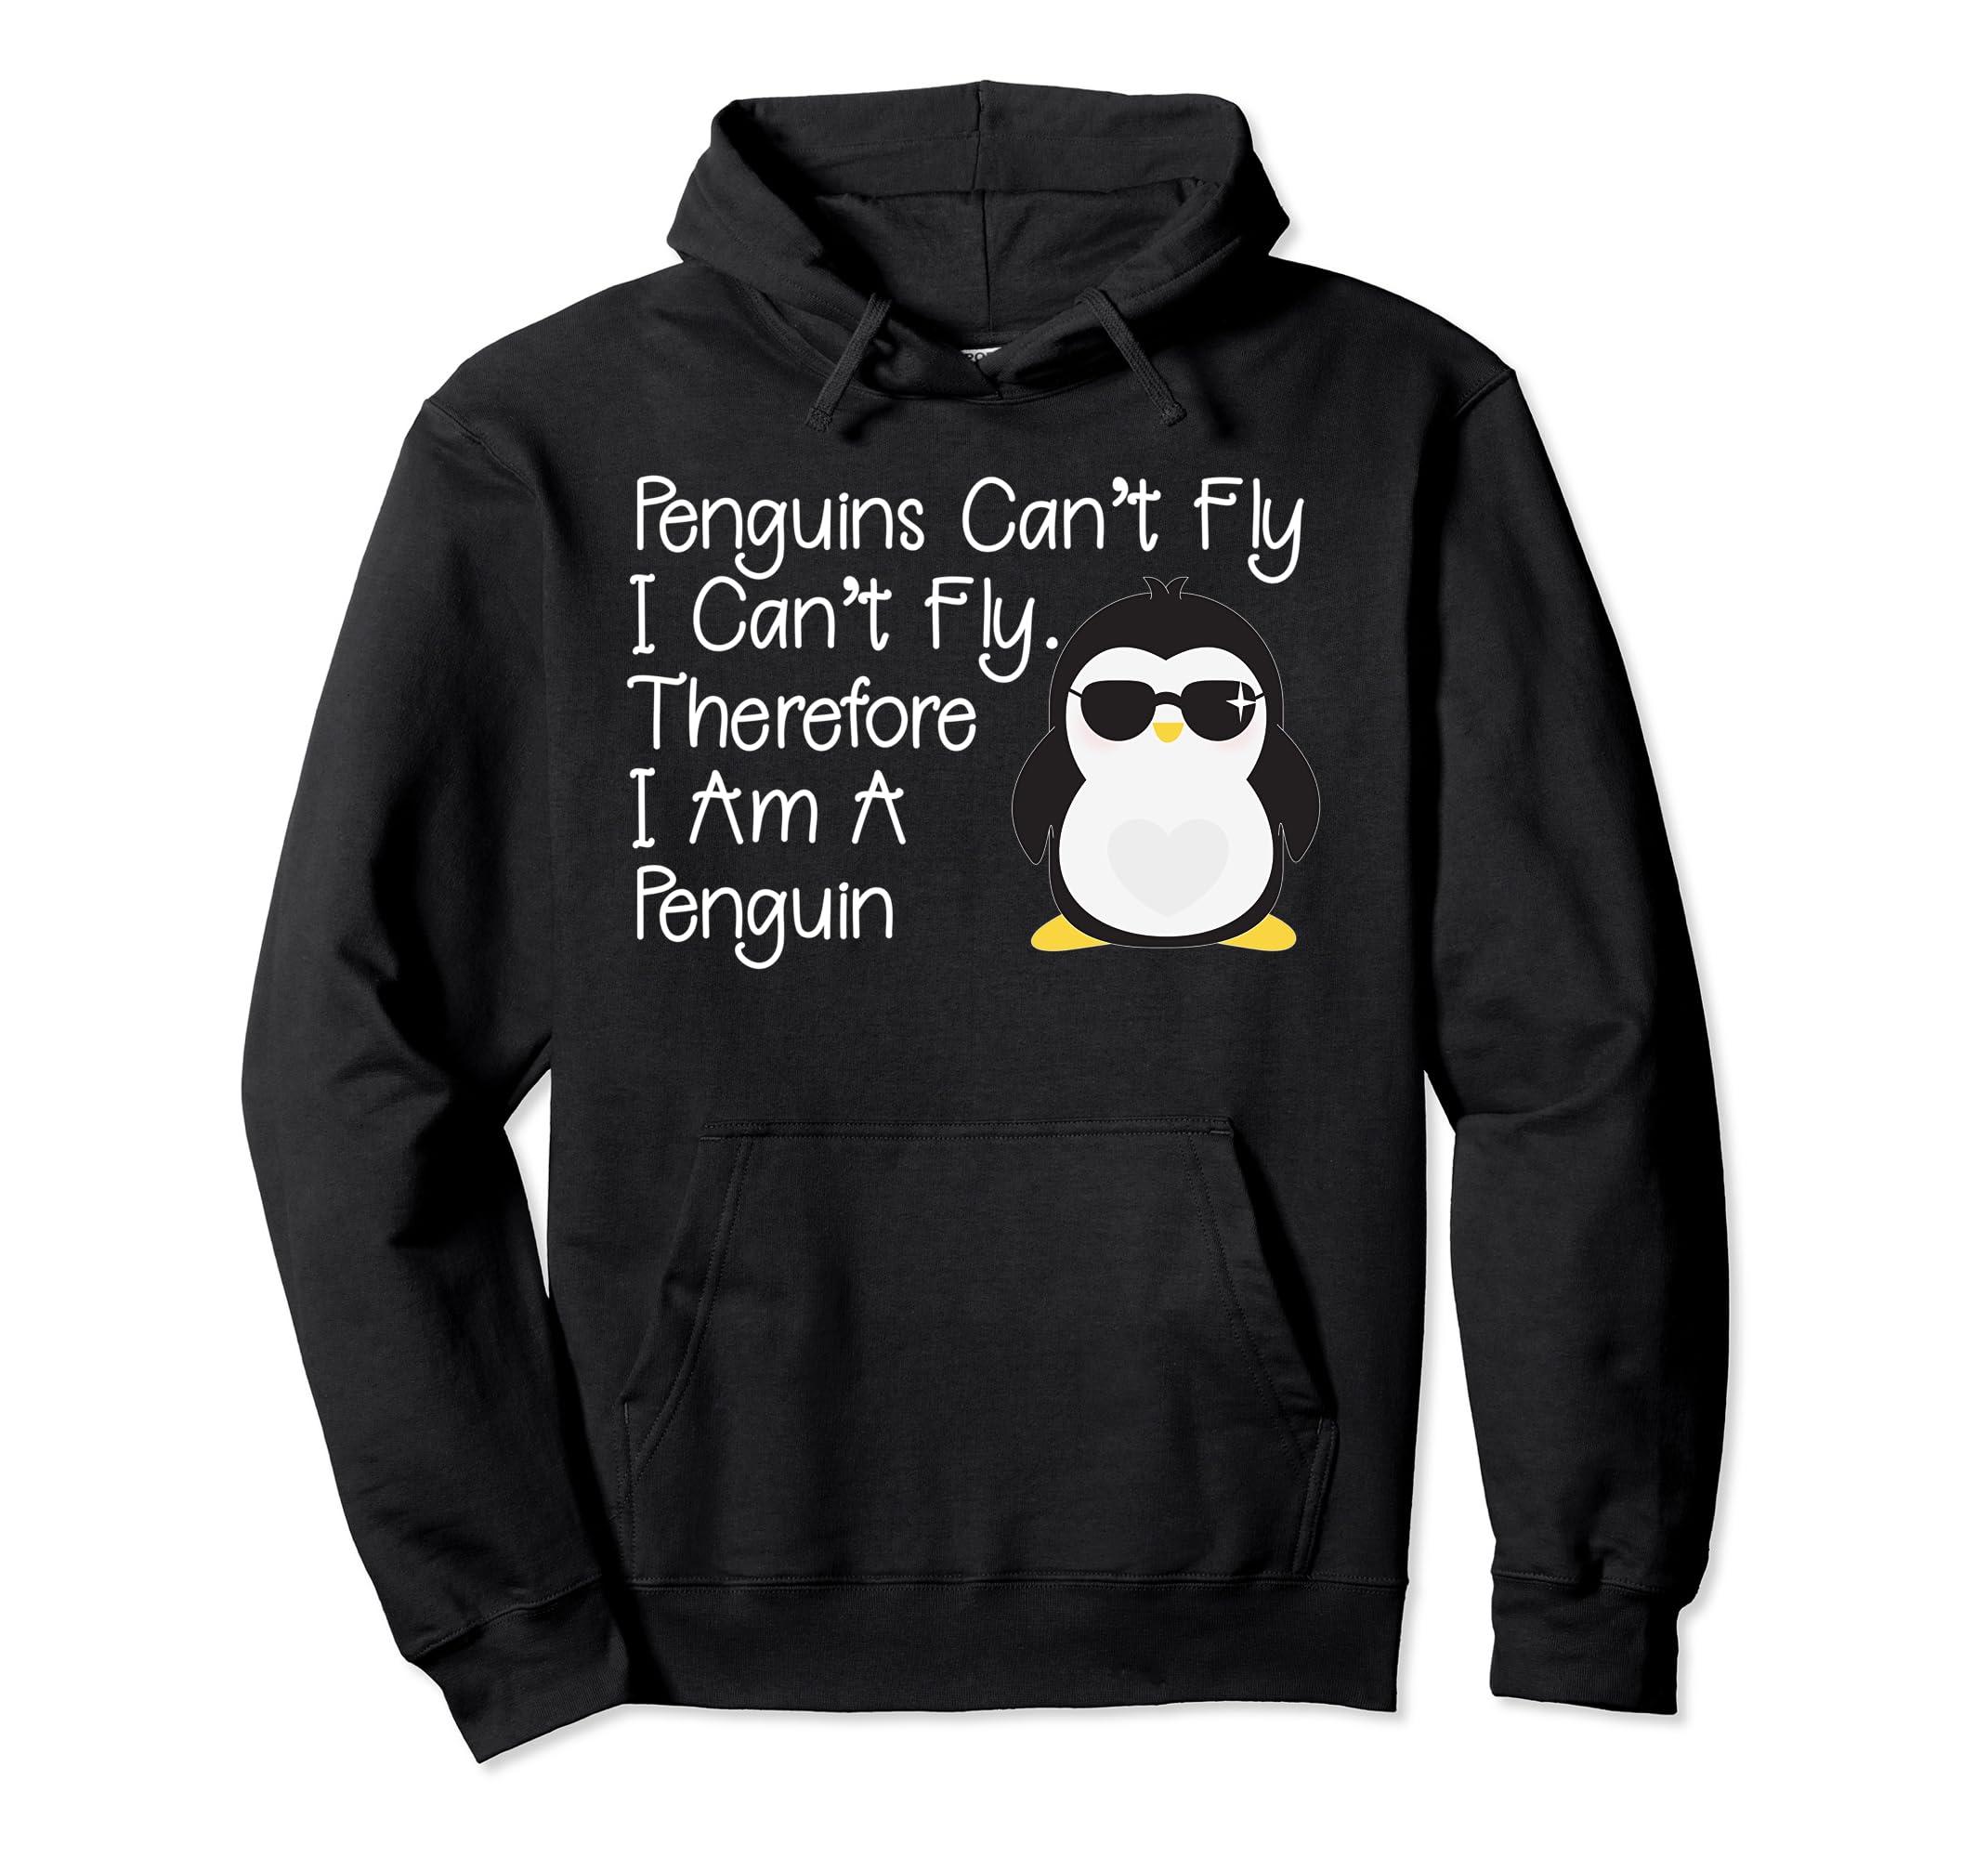 Penguins Can't Fly Penguin Hoodie Penguin Pullover-Teechatpro